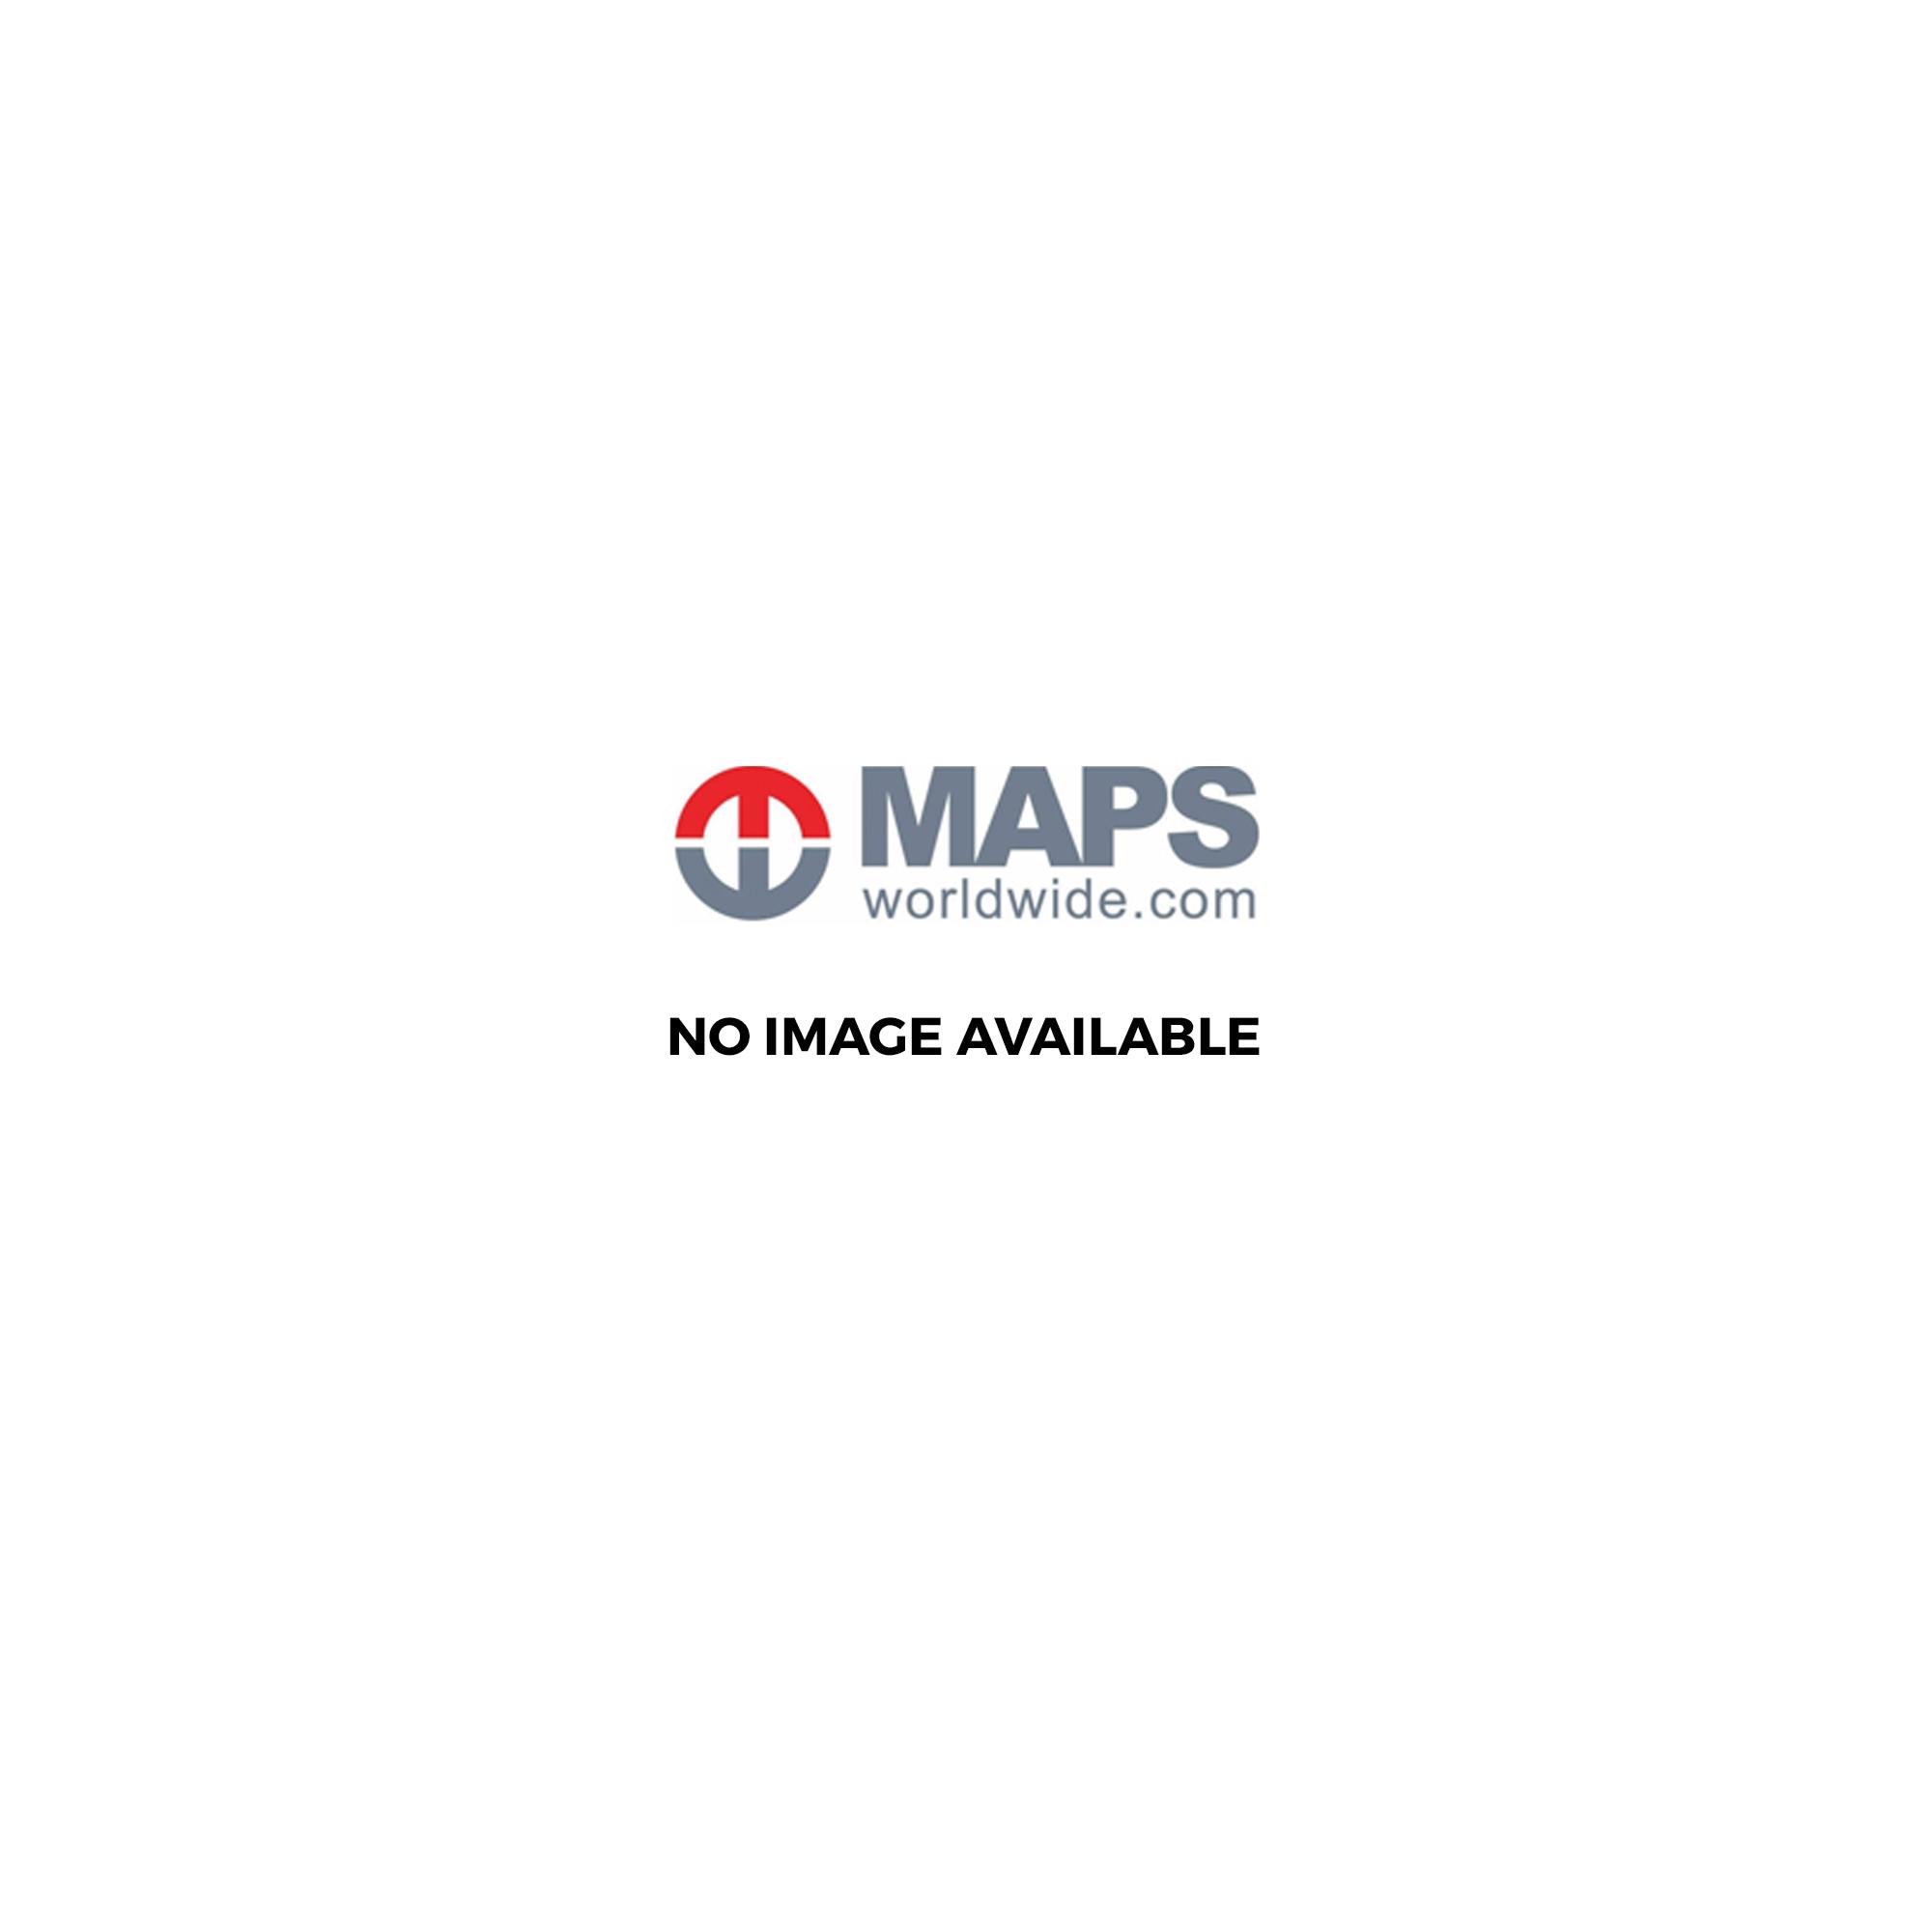 OLD ORDNANCE SURVEY MAP HAIGH HALL 1907 WIGAN STANDISH LOOP ASTLEYS